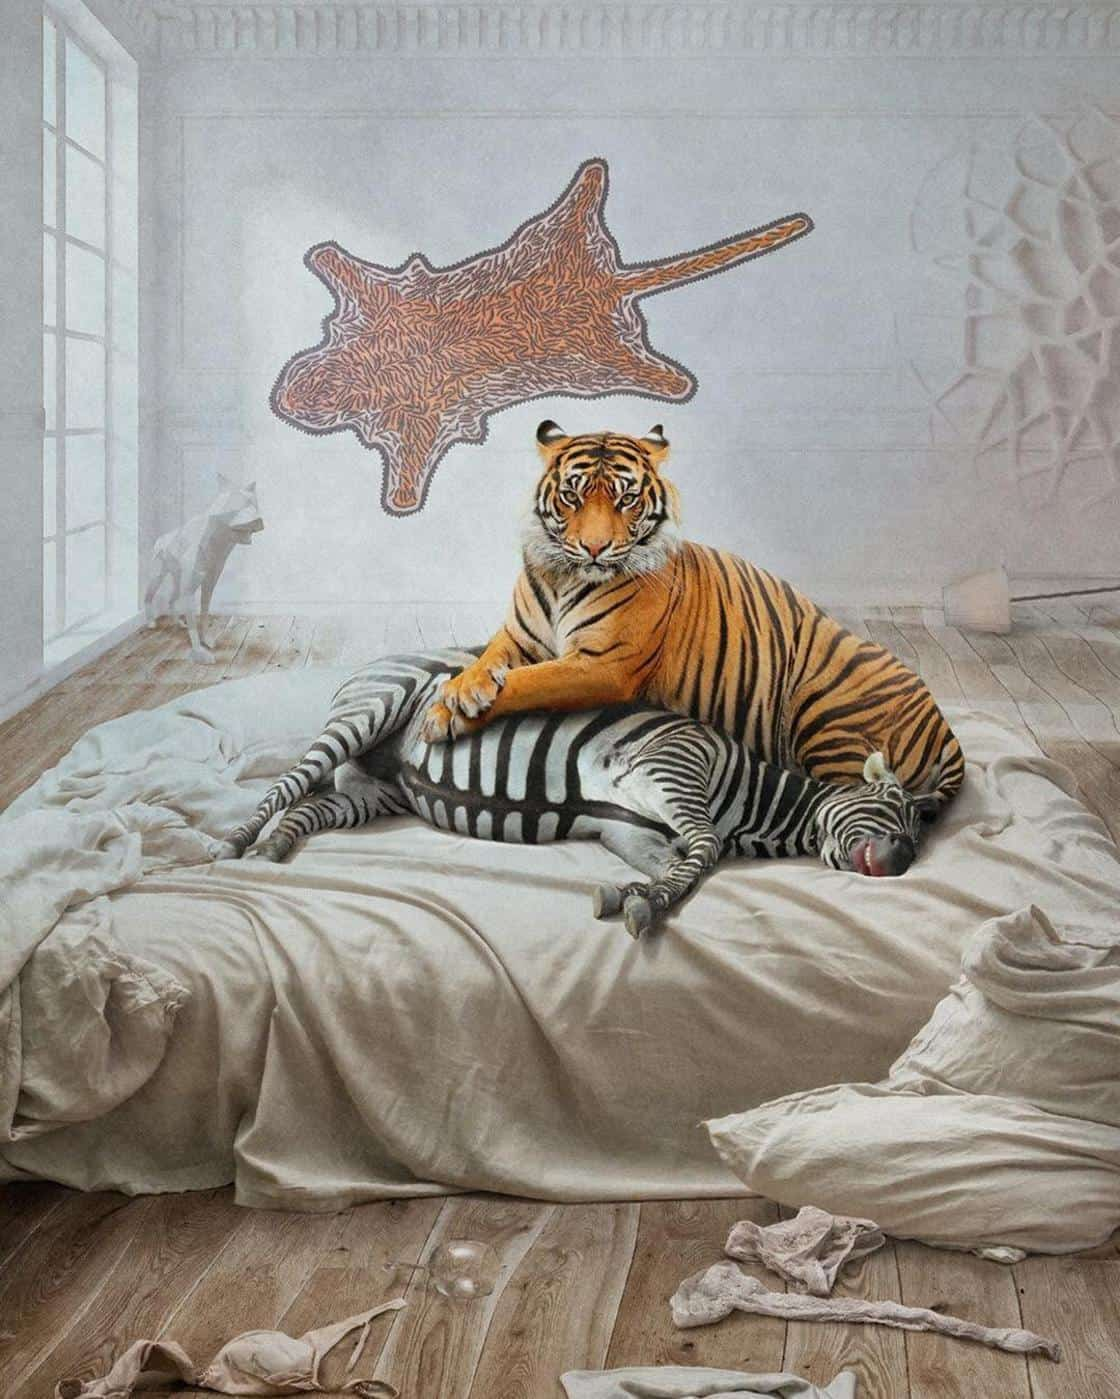 elena vizerskaya surreal photography 31